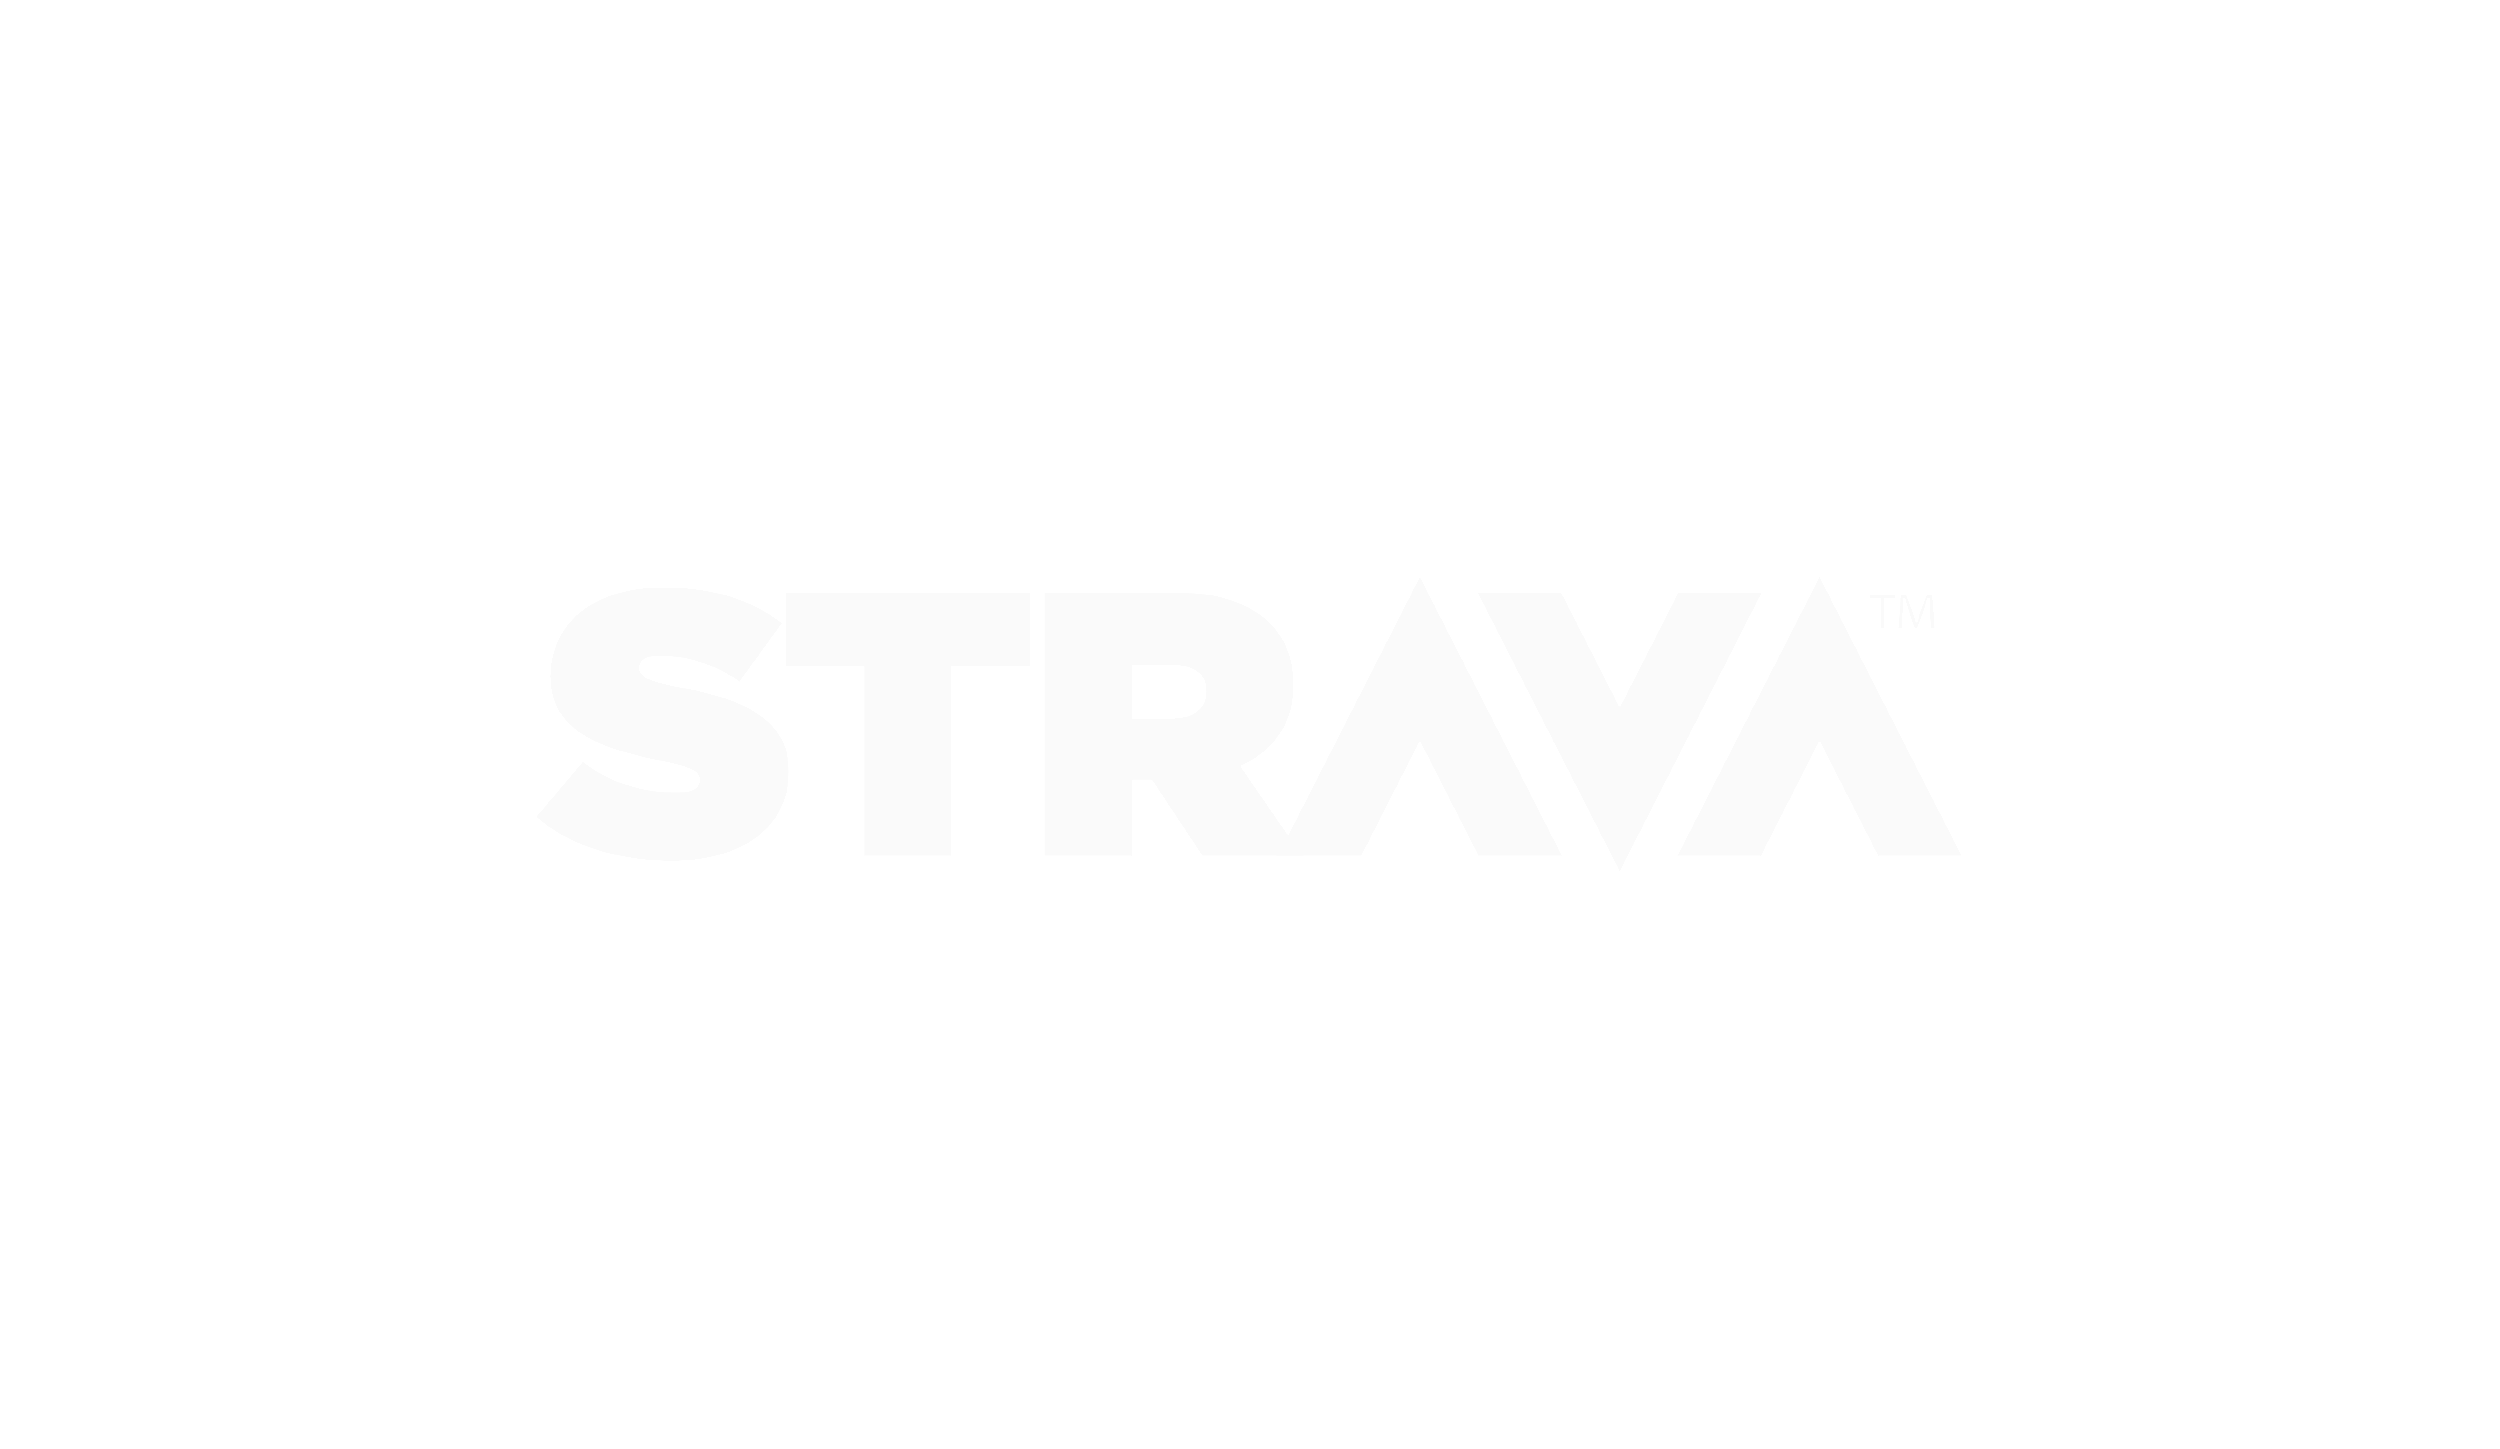 logos-Template_Bell_Lap_0000s_0007_STRAVA.png